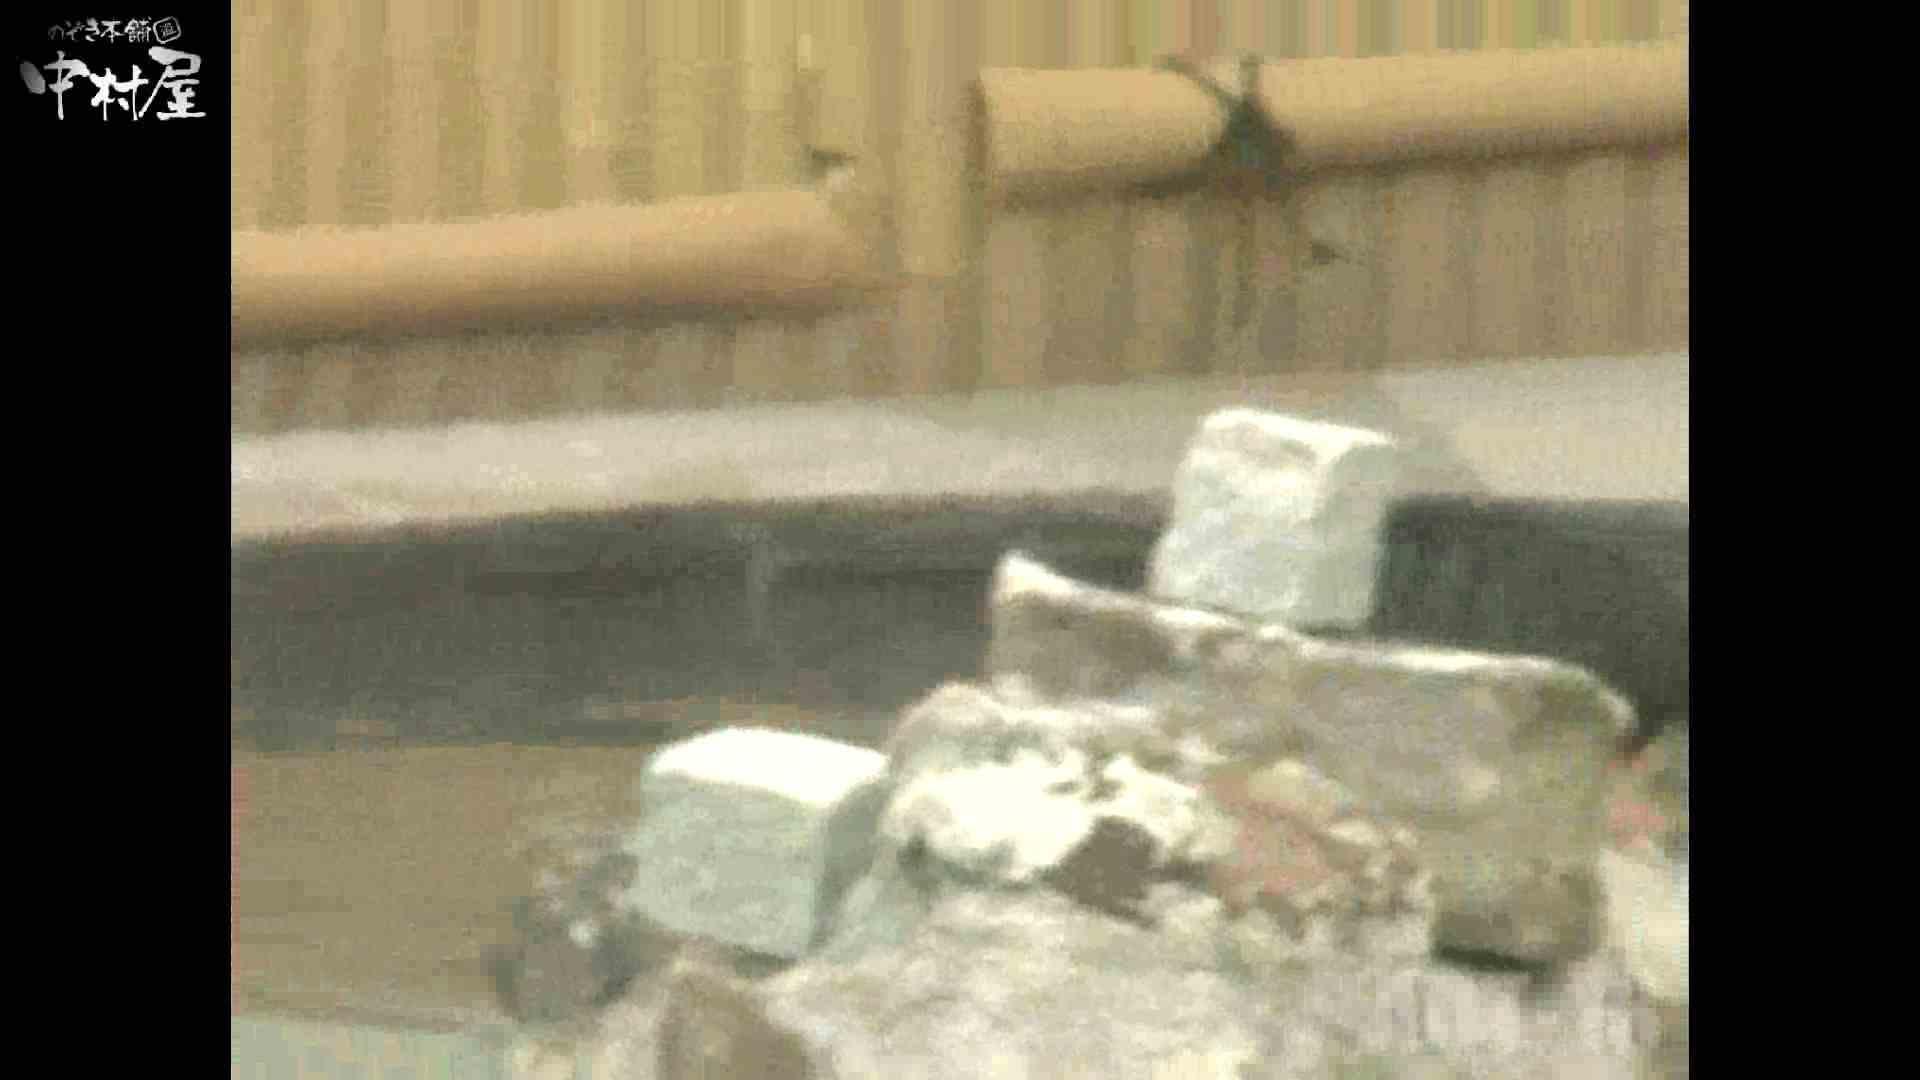 Aquaな露天風呂Vol.882潜入盗撮露天風呂十八判湯 其の七 盗撮 AV動画キャプチャ 84画像 50